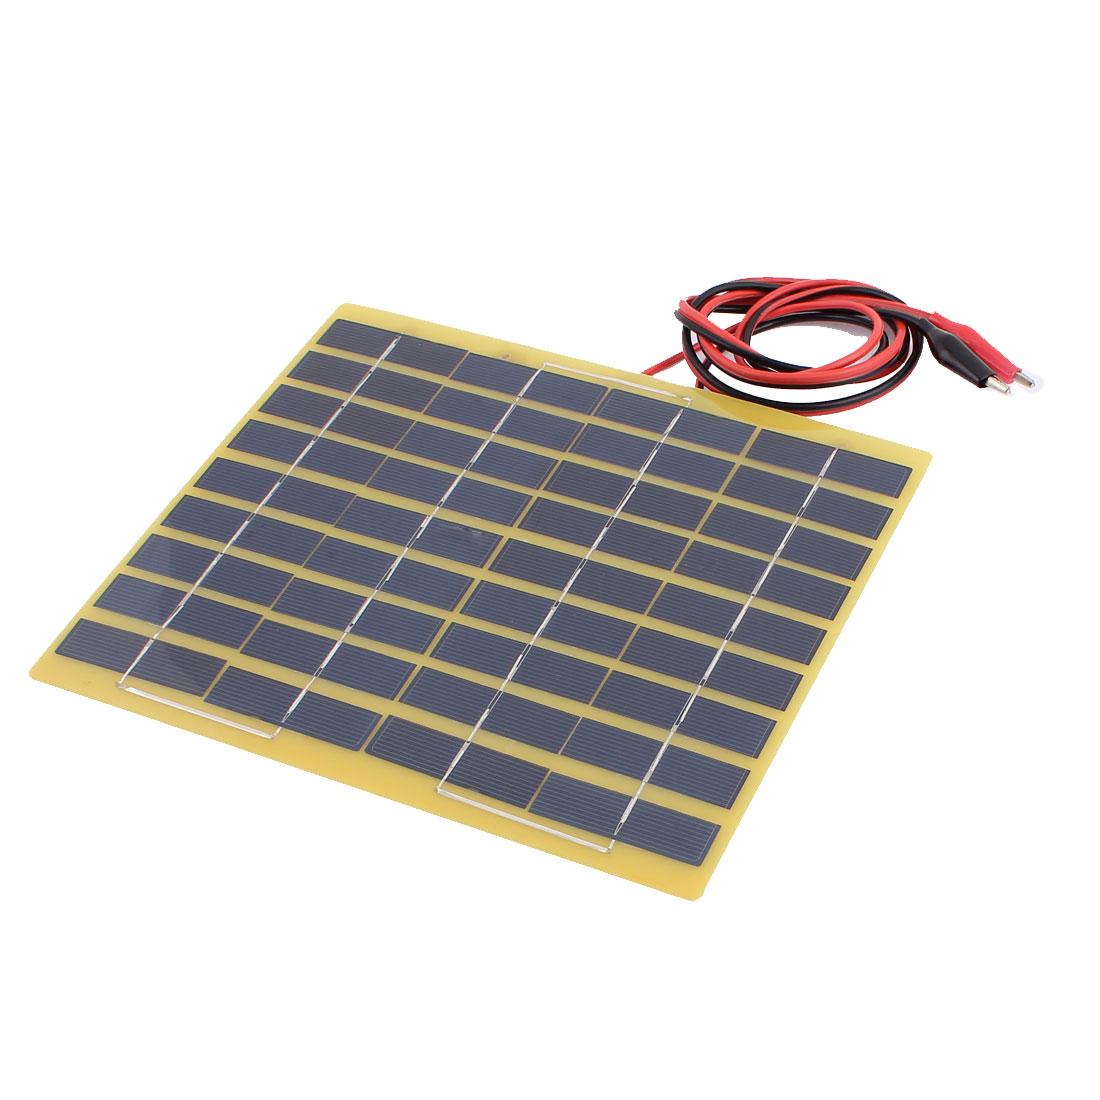 DC 18V 5W Polysilicon Energy Saving Solar Cell Panel Module w Alligator clips